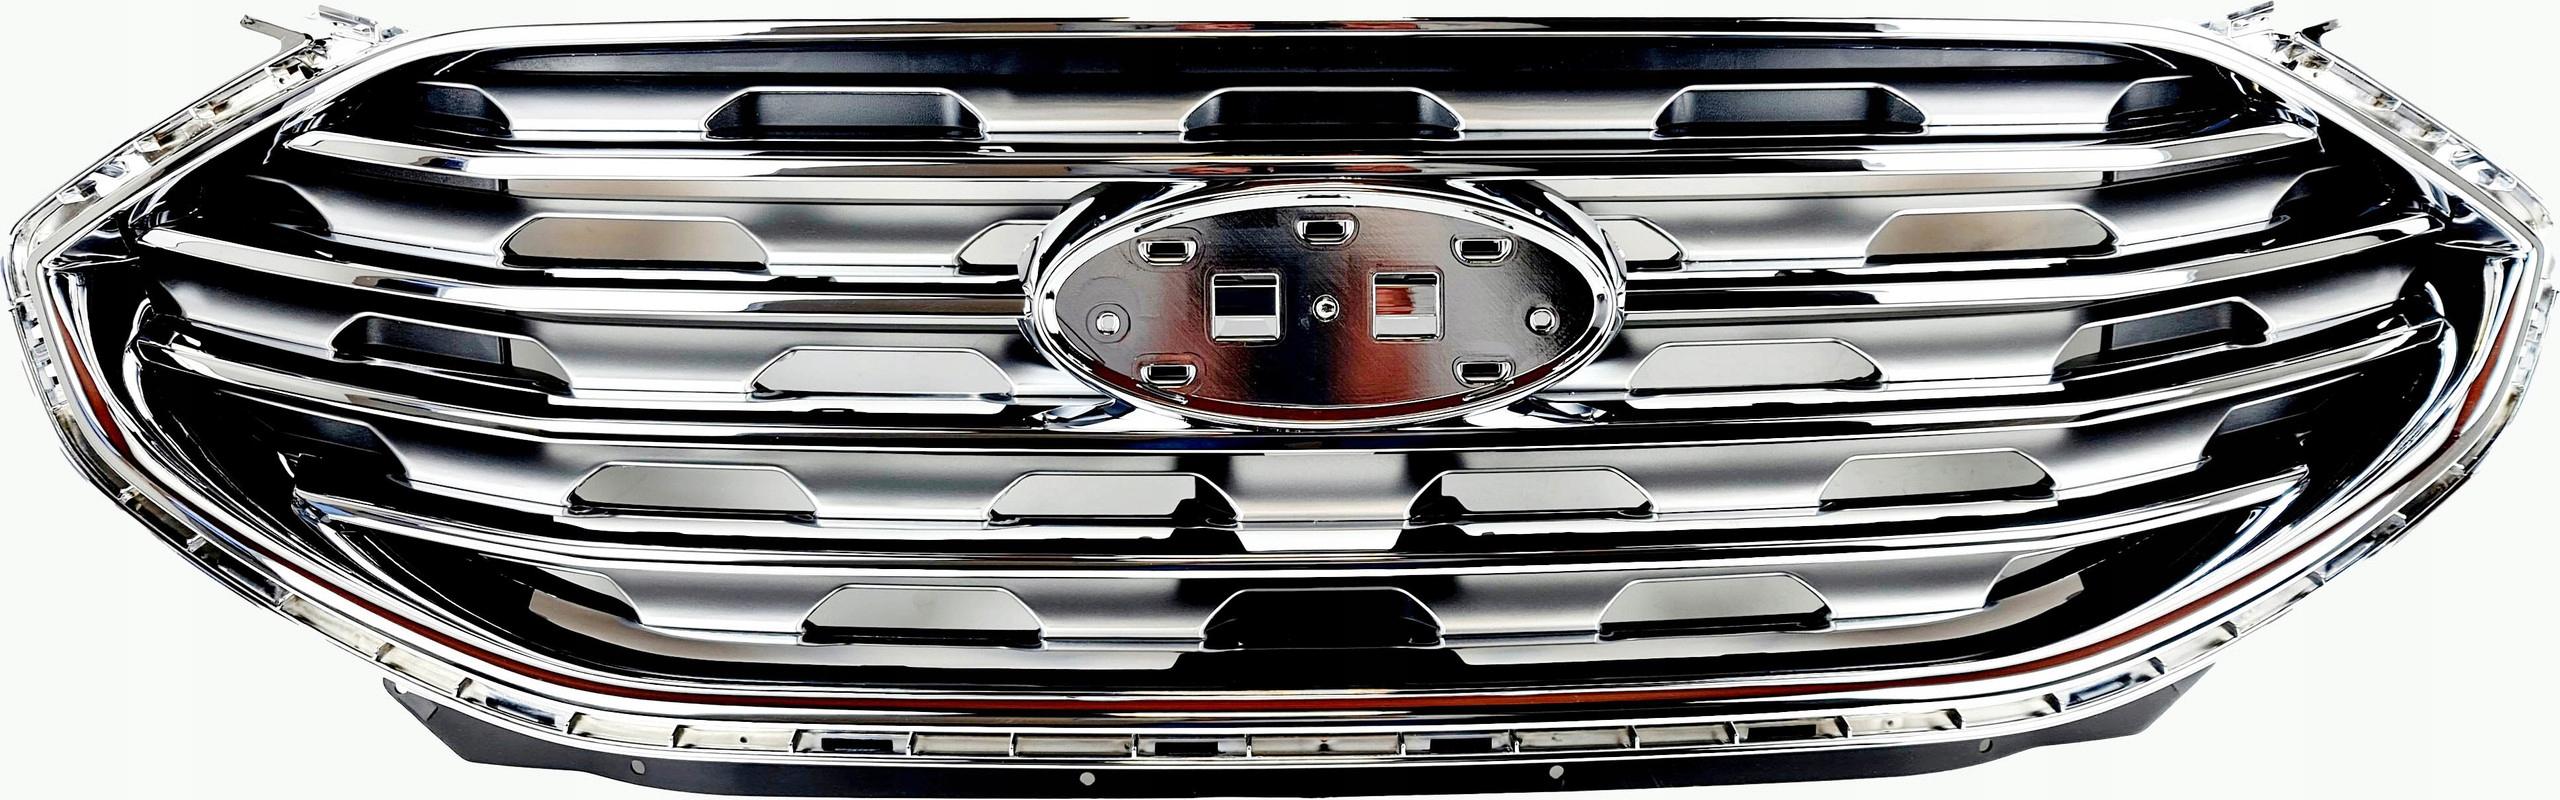 ford edge 2019 2020 новый гриль решетка хром сша